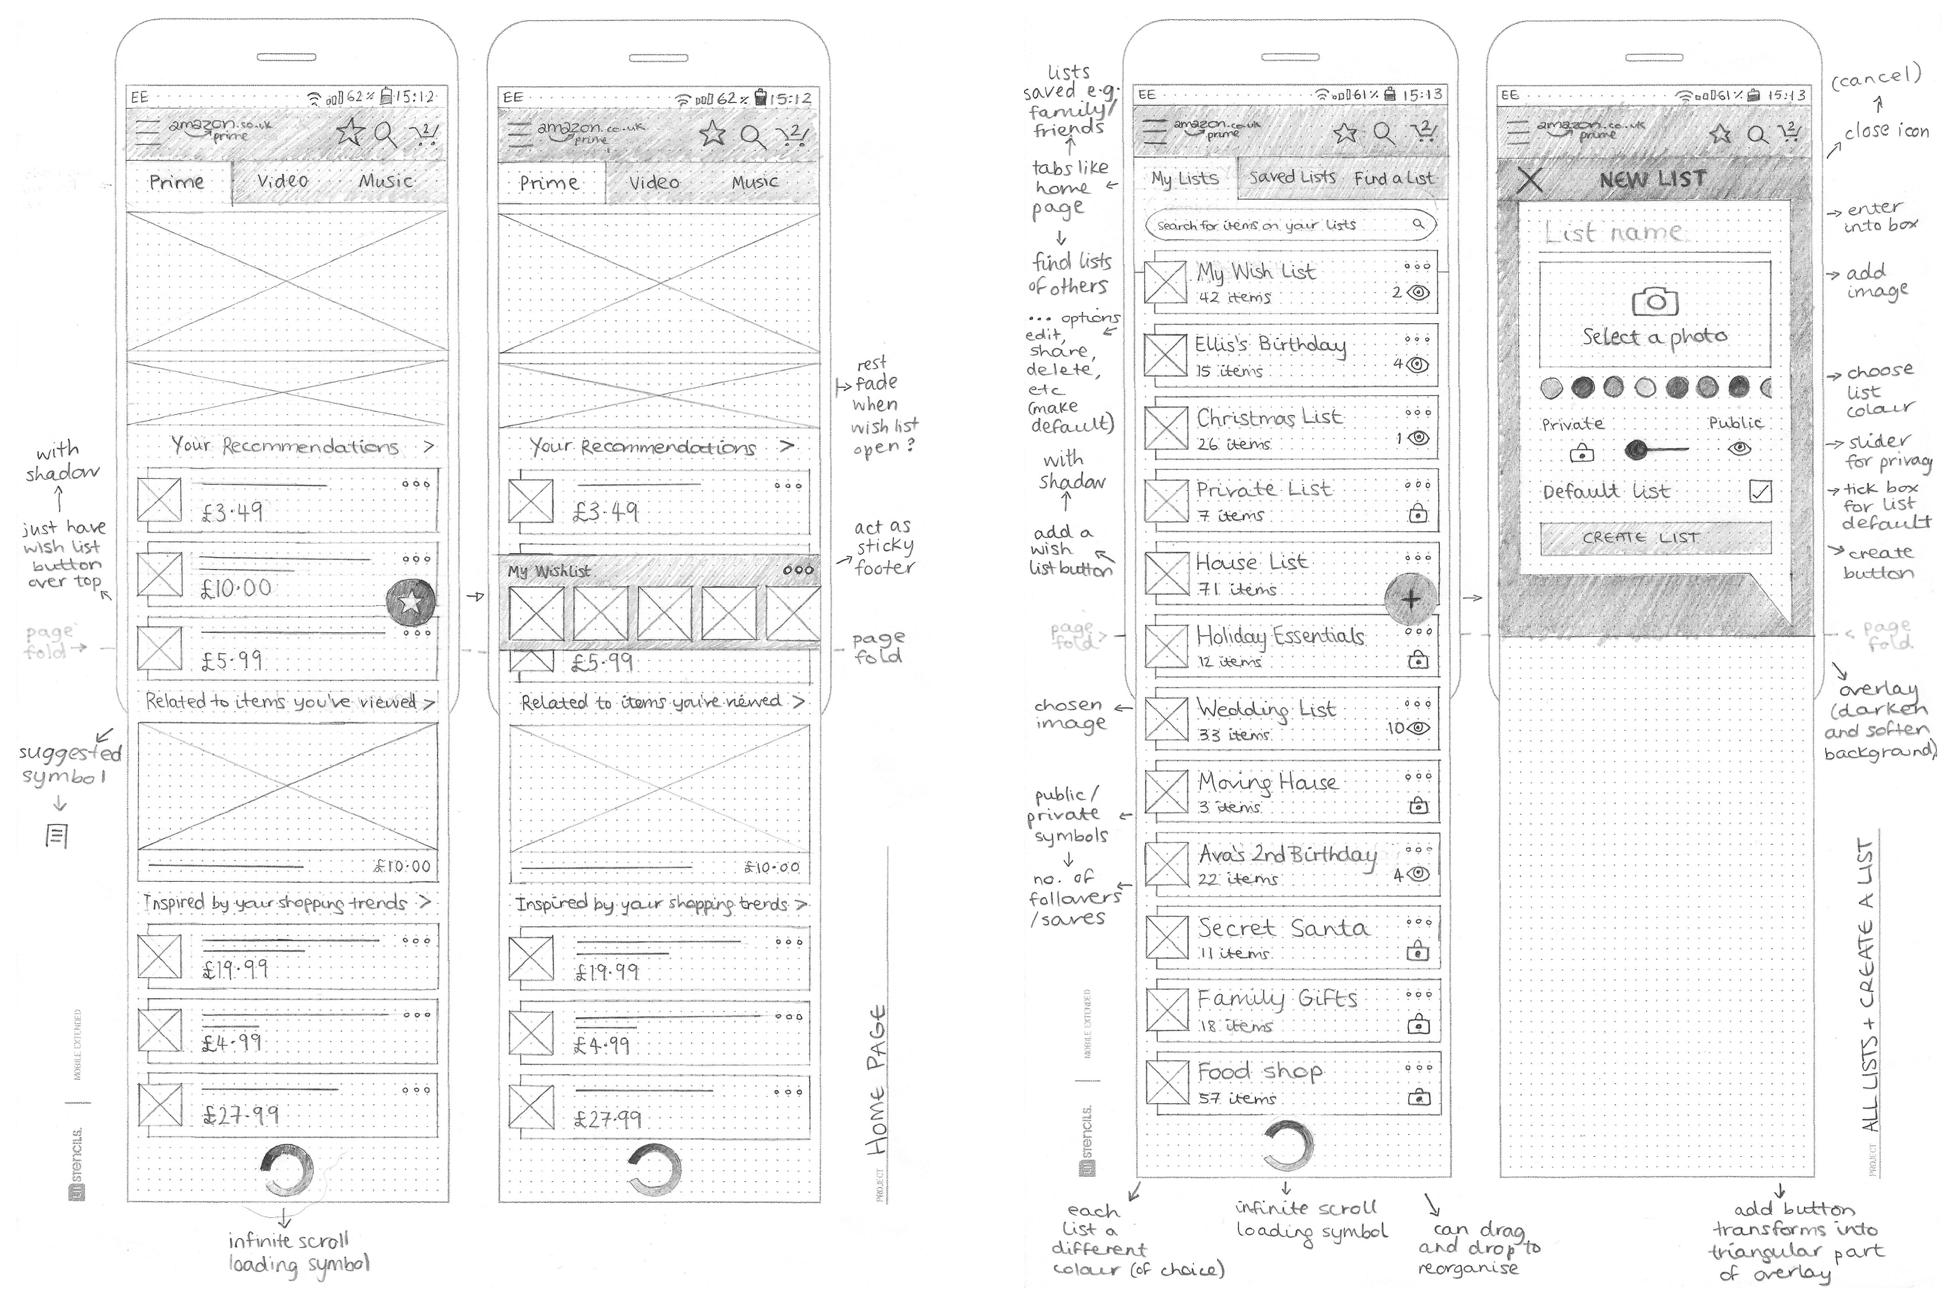 build an e-commerce app like amazon